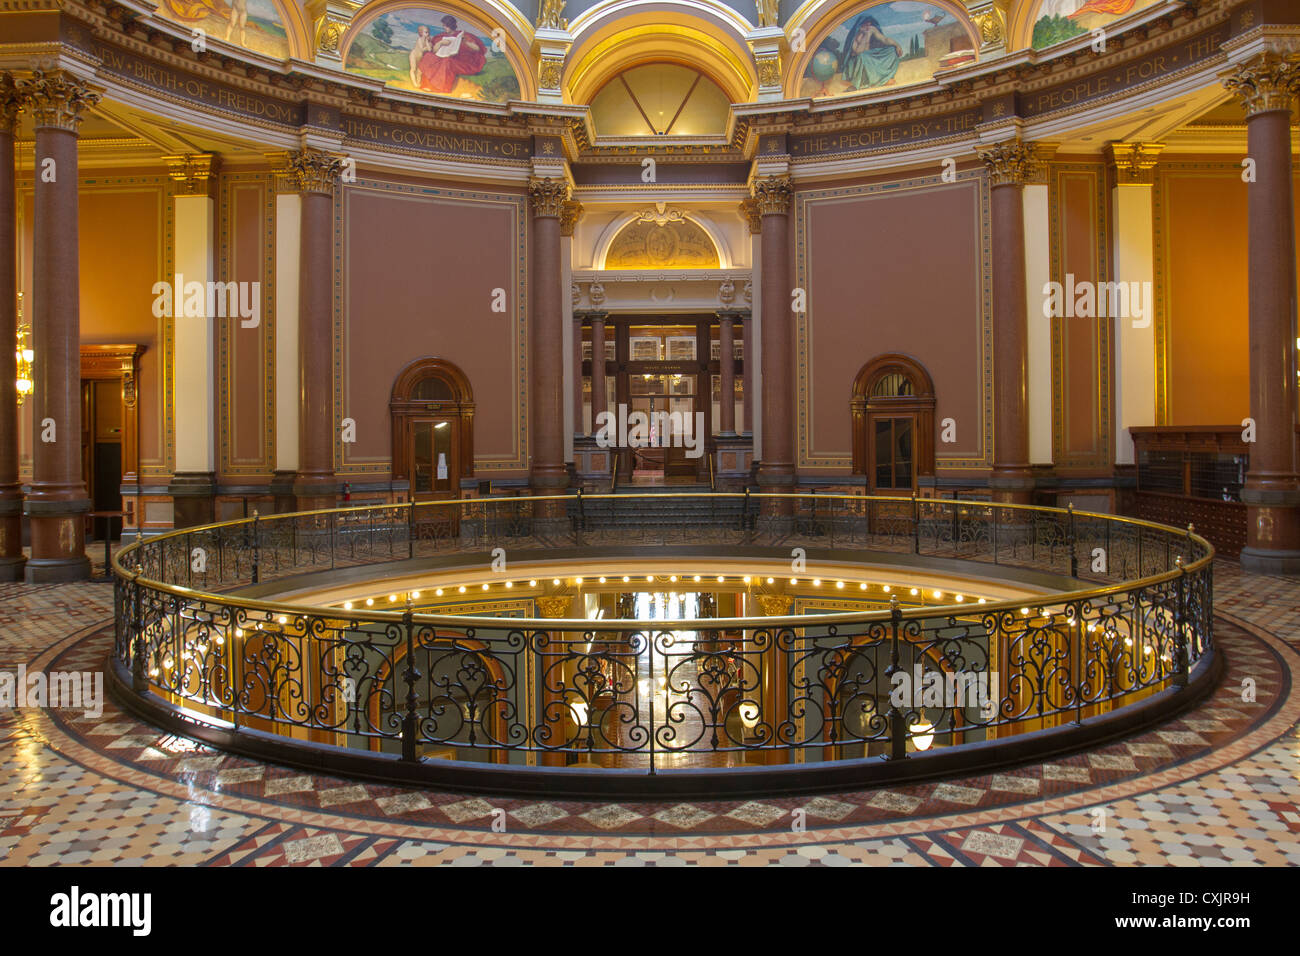 Rotunda Entrance To The Senate Chamber In The Iowa State